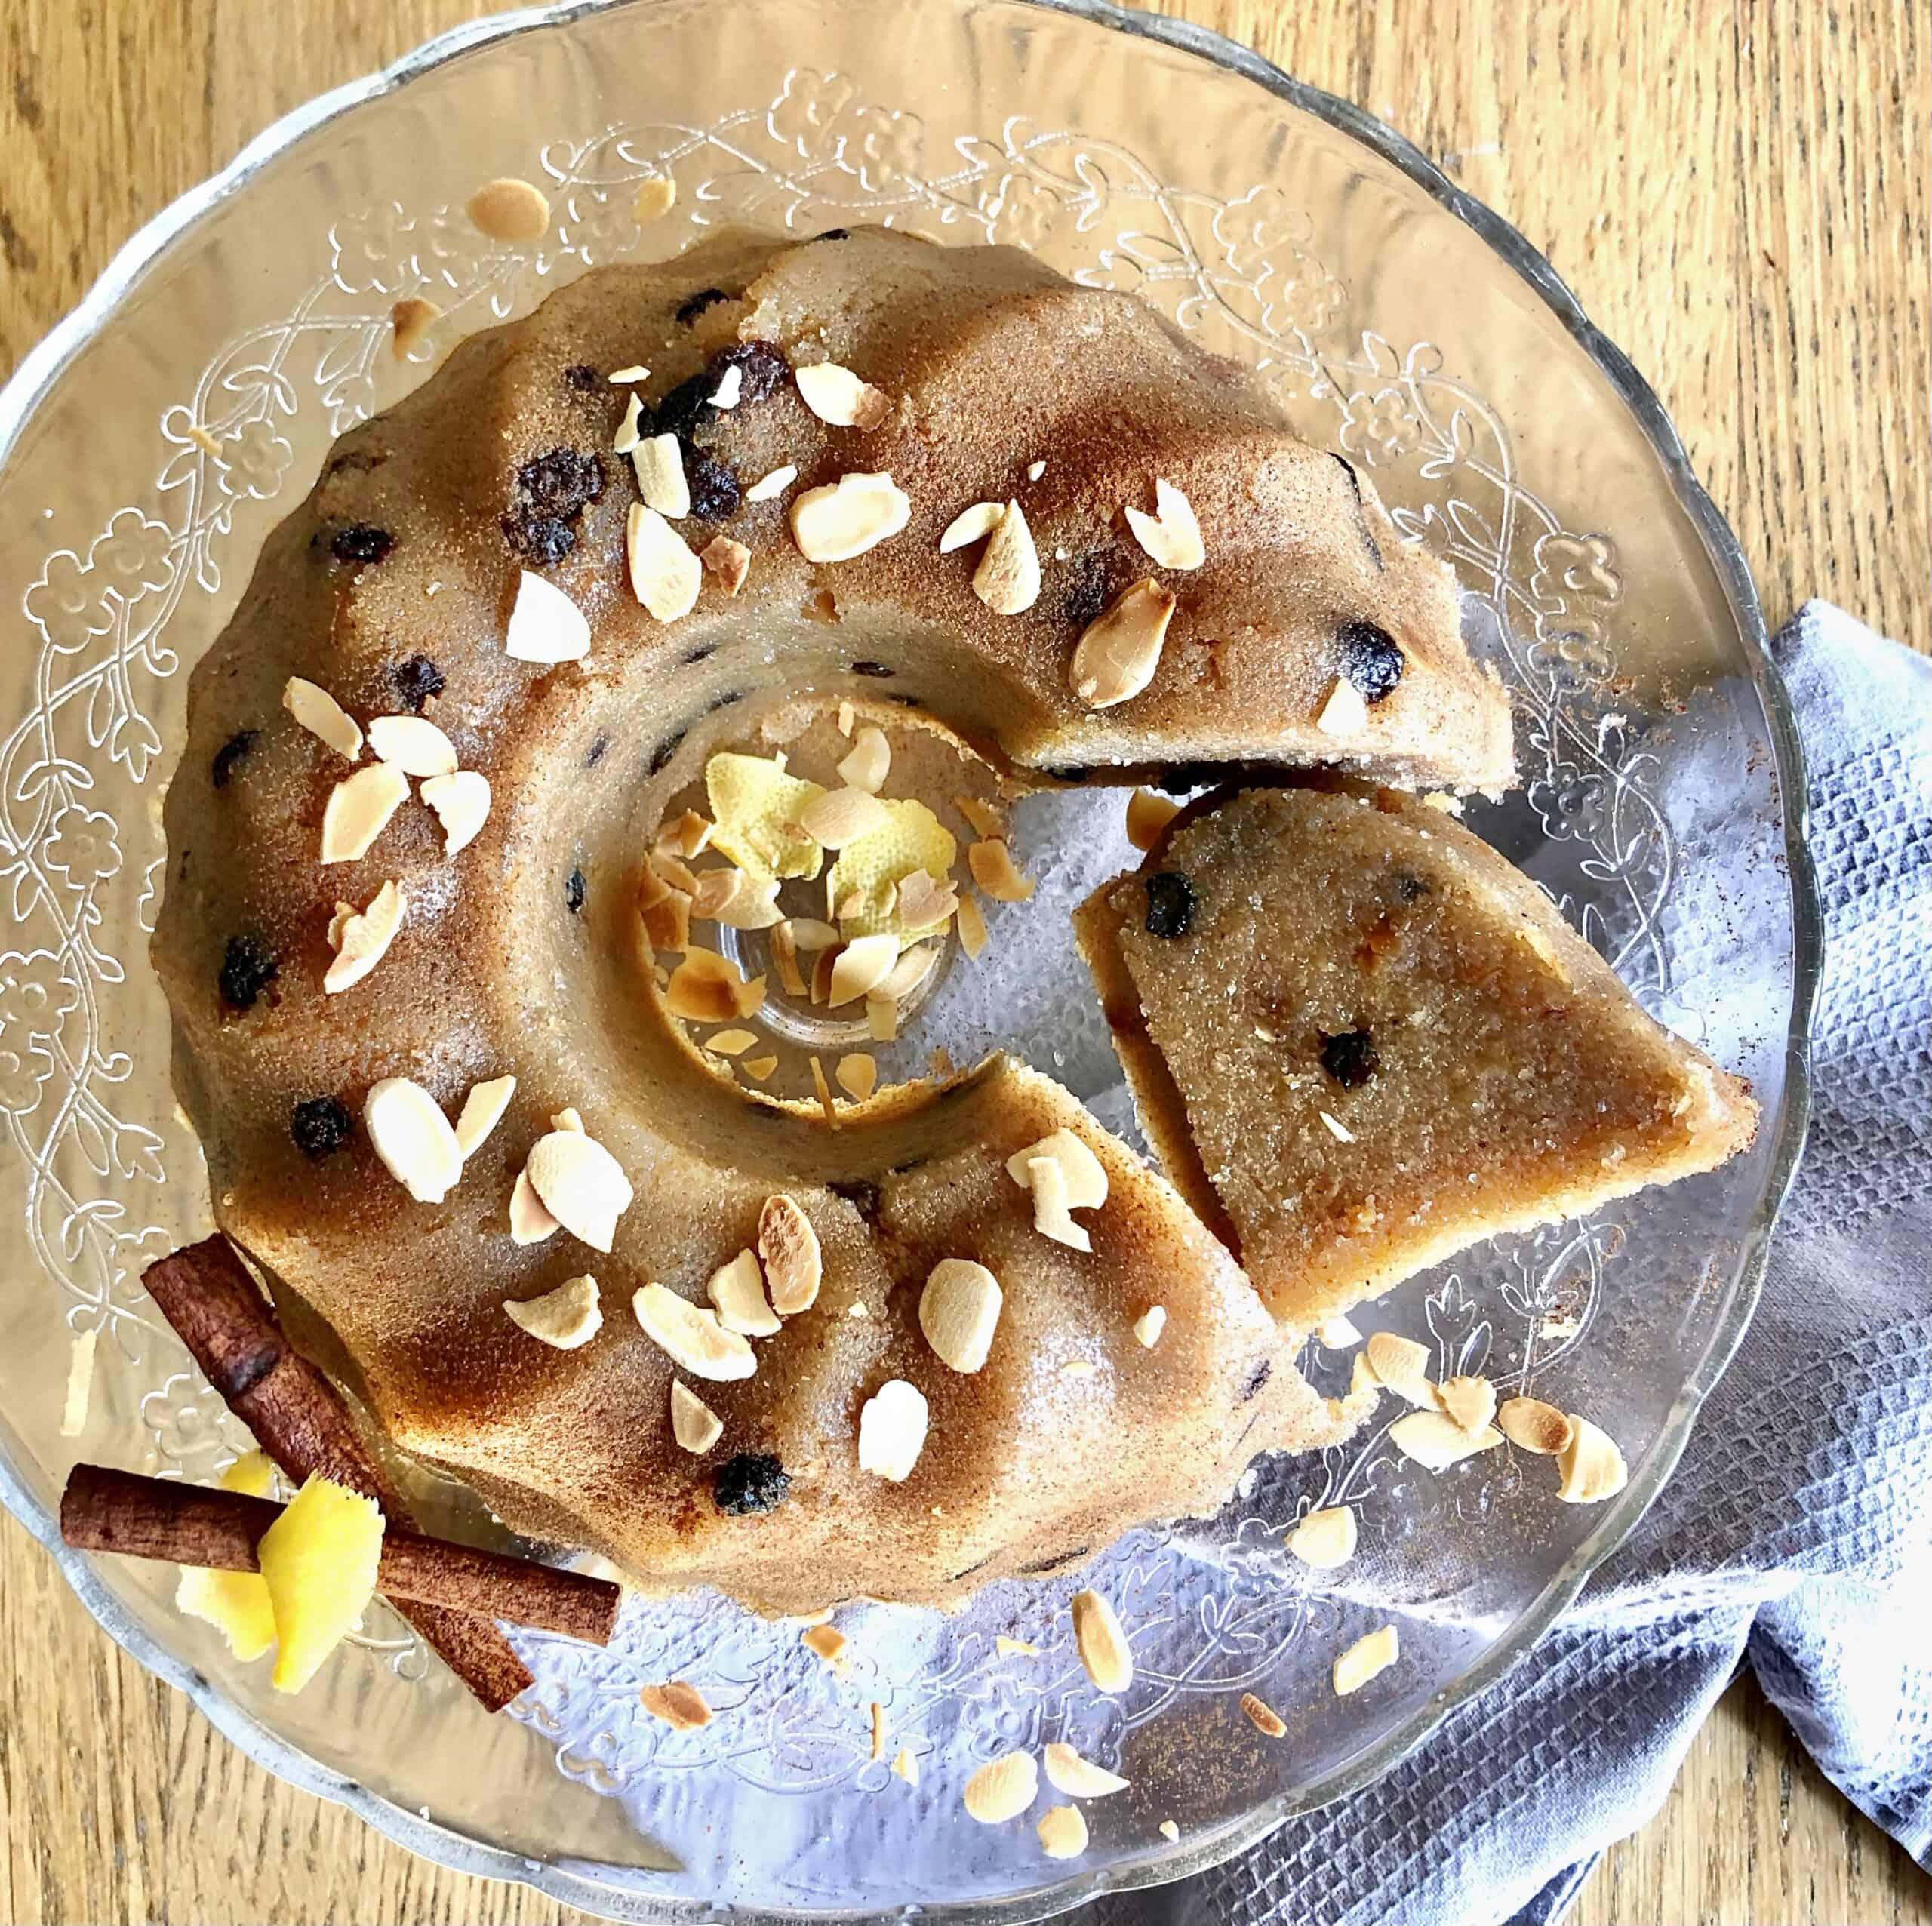 Greek Halva recipe (Semolina Pudding with nuts)